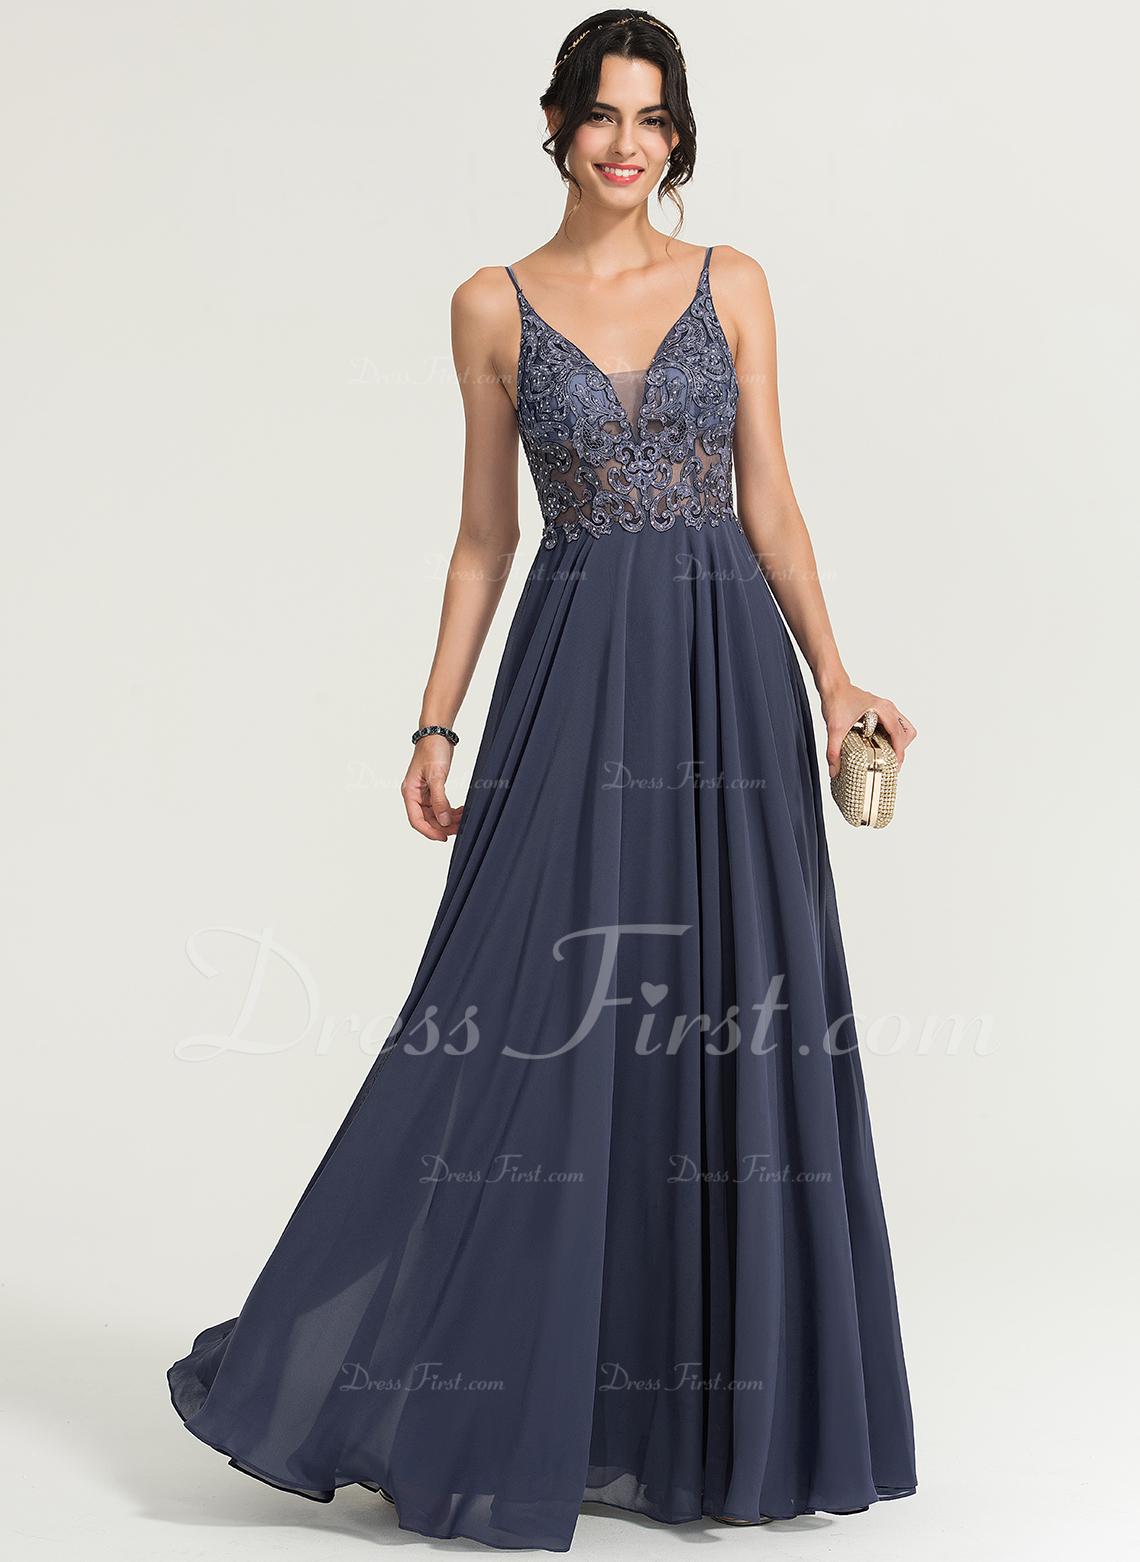 A-Line V-neck Floor-Length Chiffon Prom Dresses With Beading